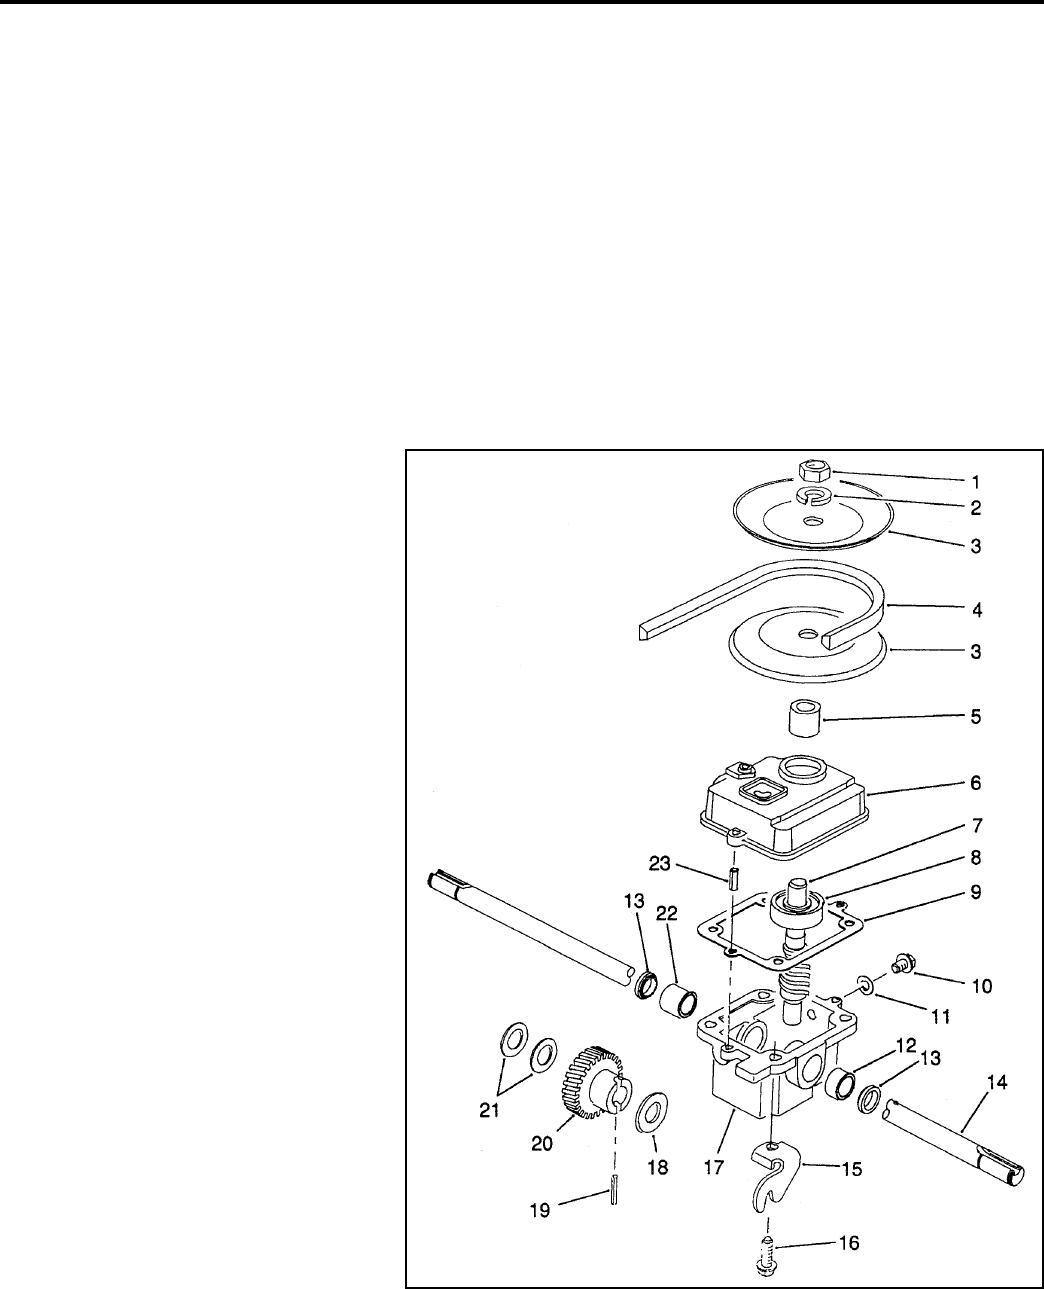 !! Toro Lawn Boy Walk Behind Power Mower Drive Systems Manual